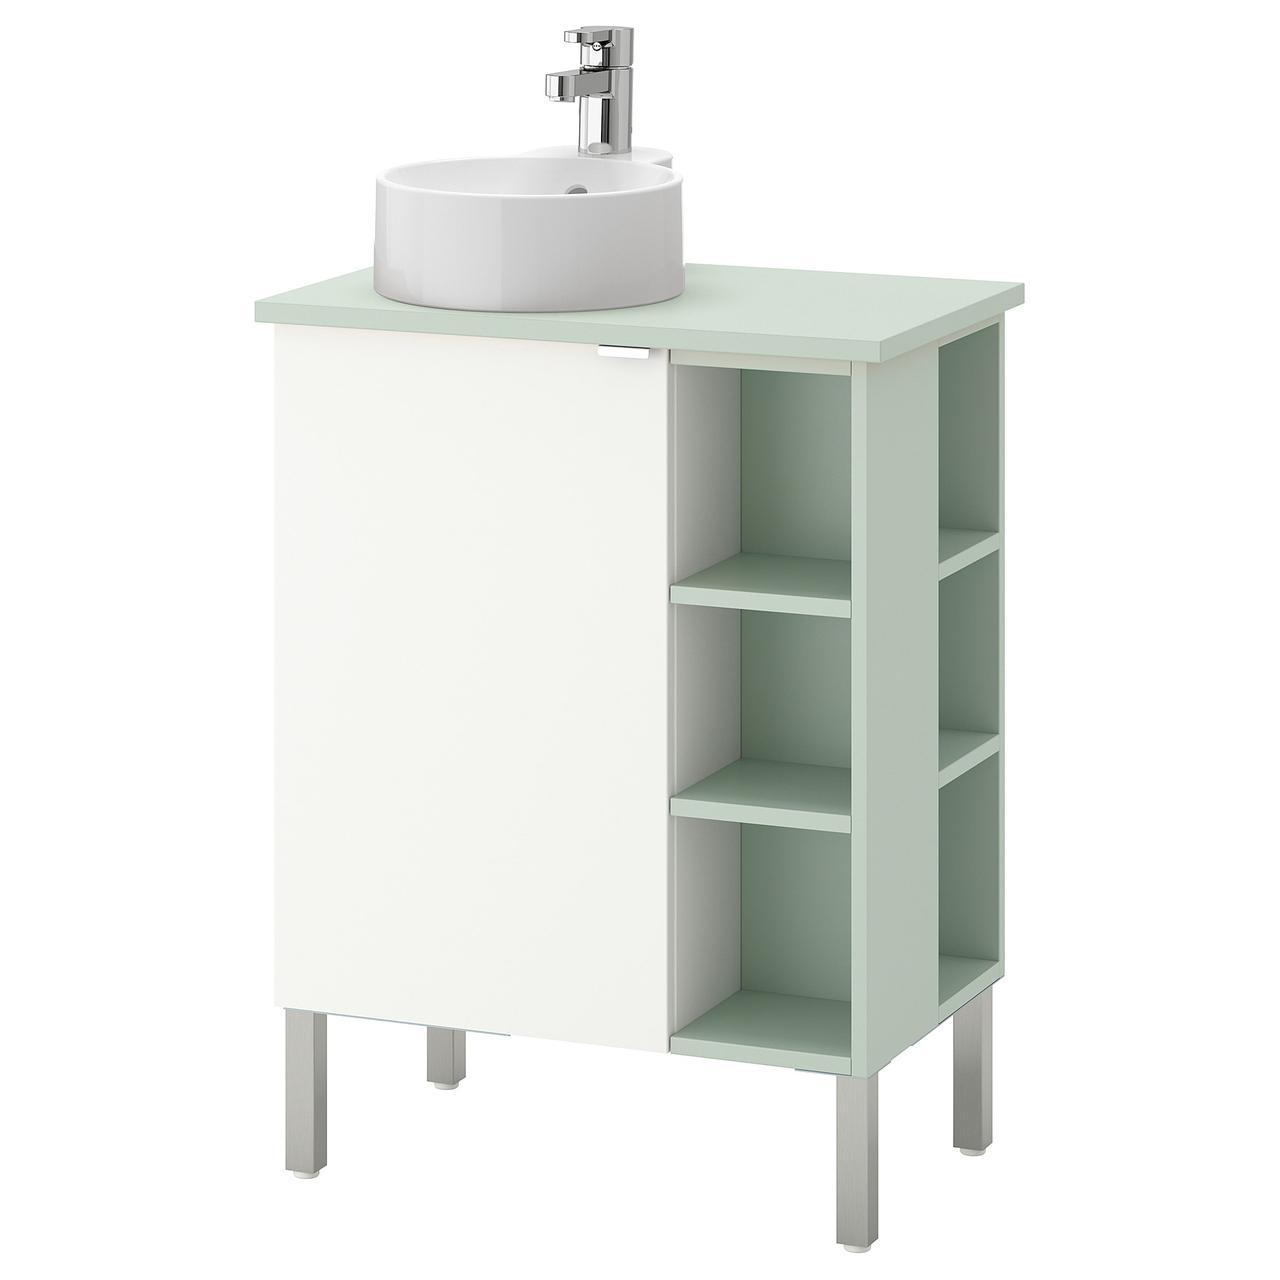 IKEA LILLANGEN/VISKAN/GUTVIKEN Шкаф под умывальник с раковиной, белый, (792.065.93)